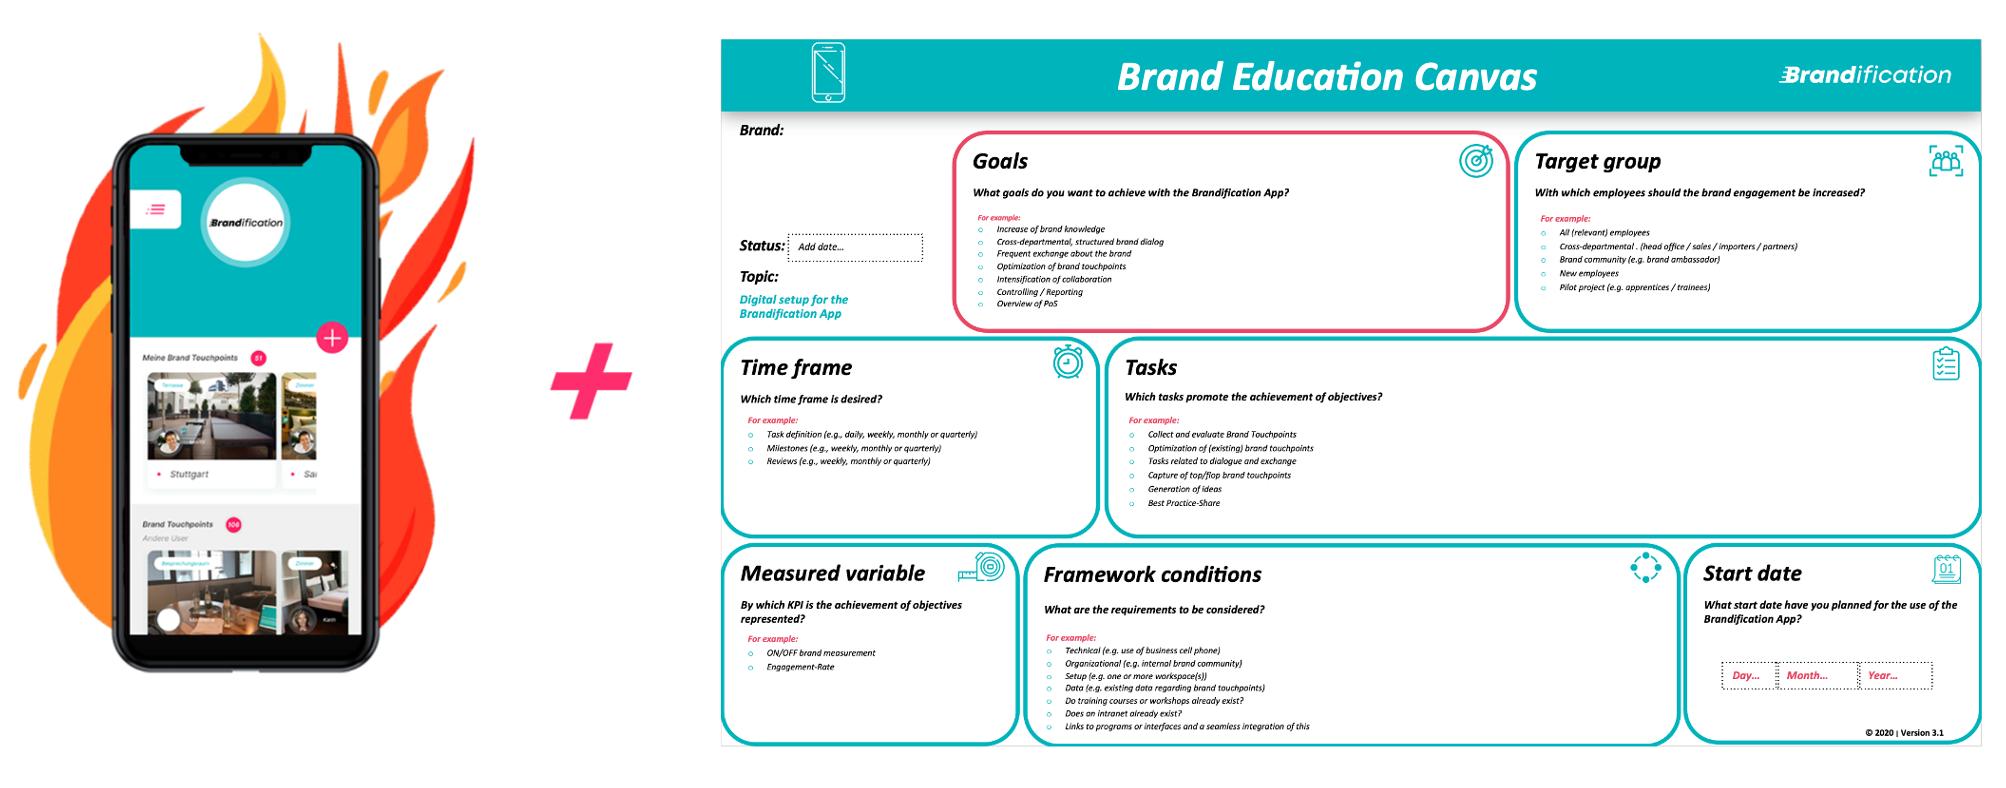 Brandification Brand Education Canvas